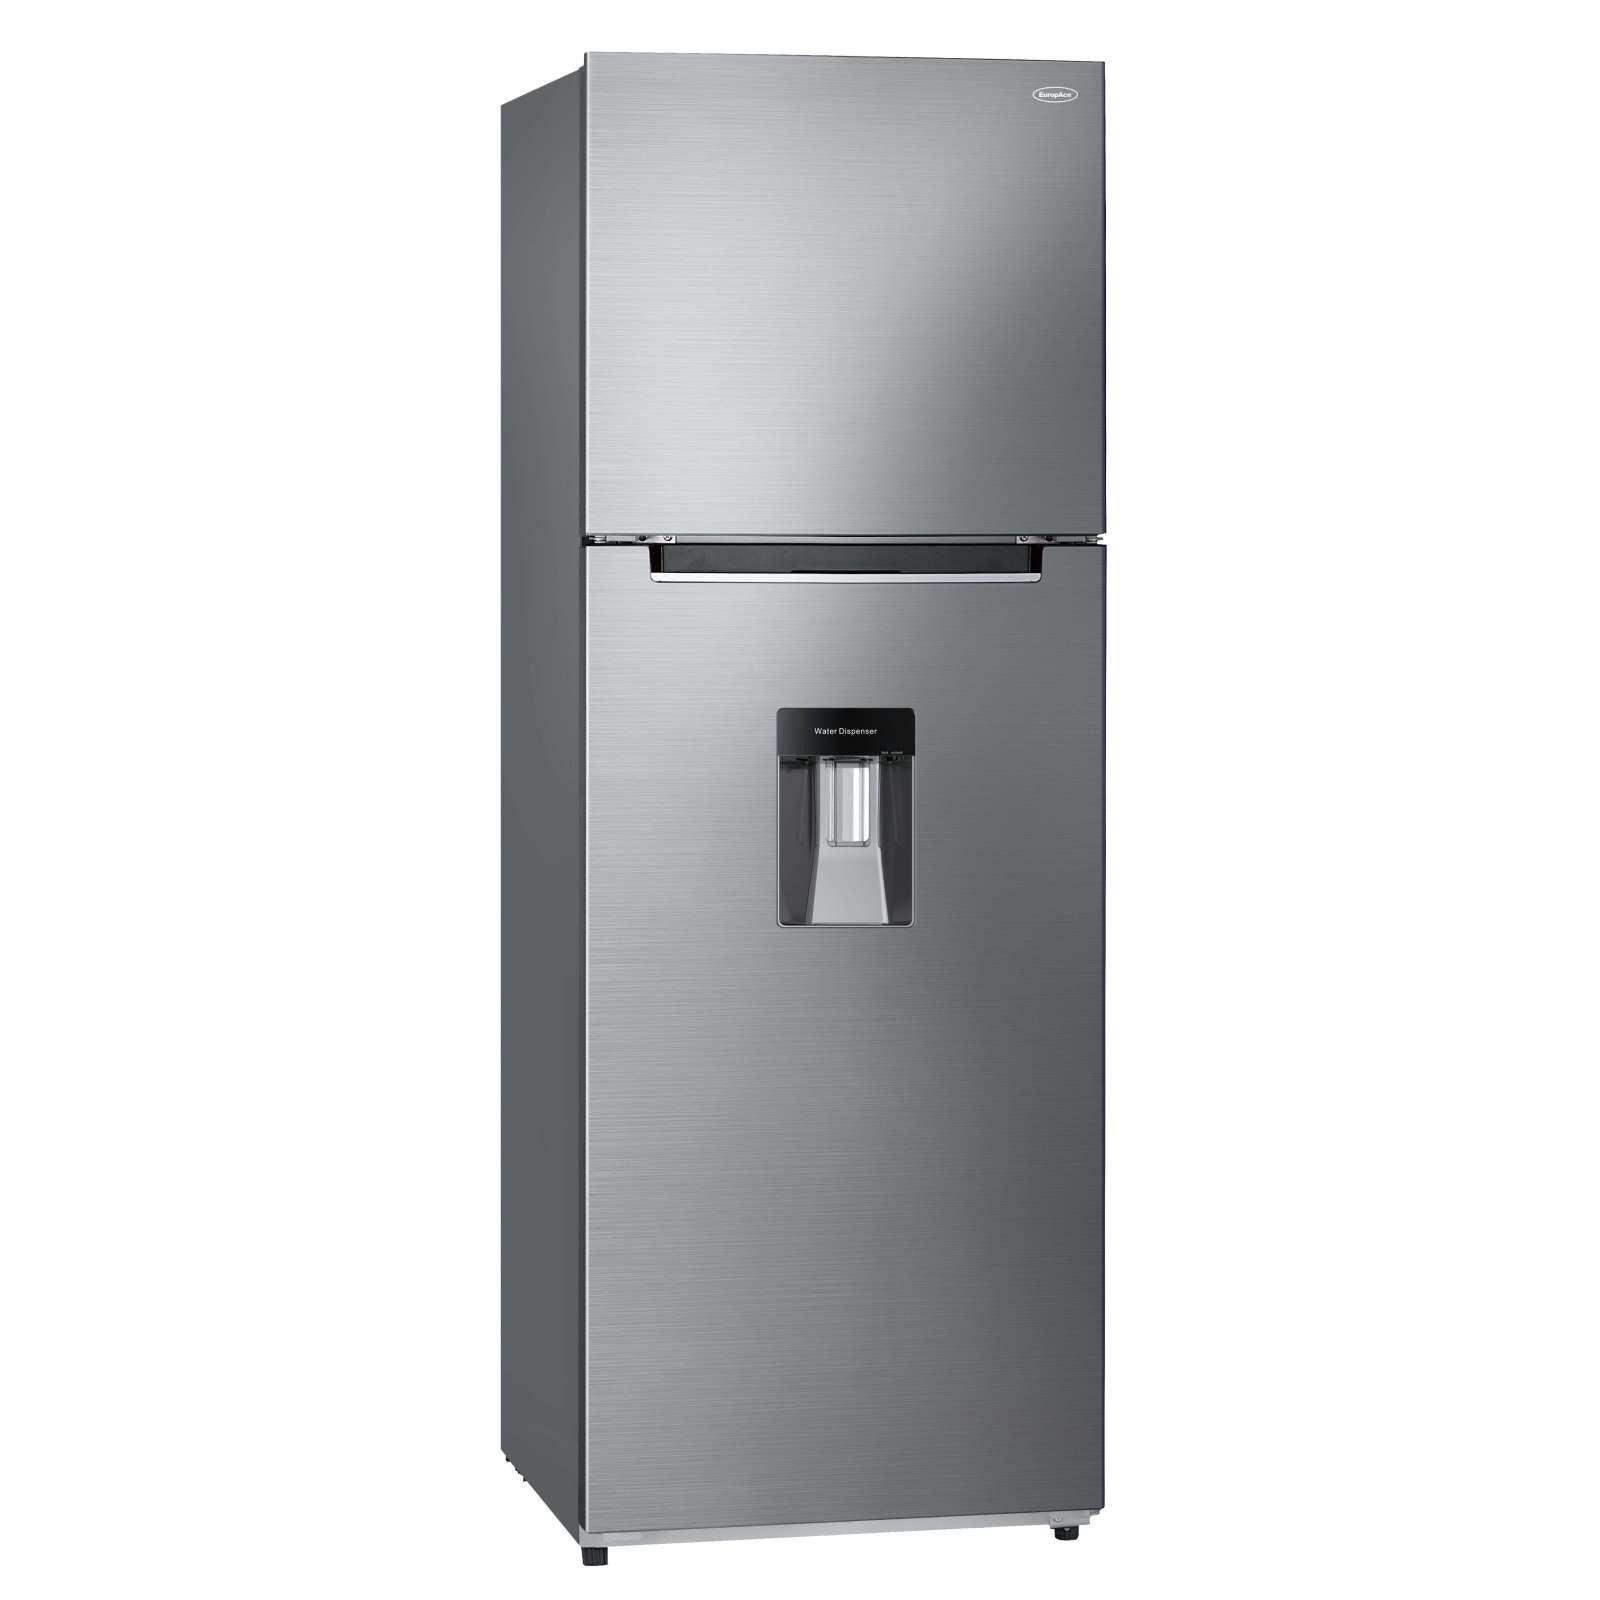 EuropAce ER3372T Refrigerator